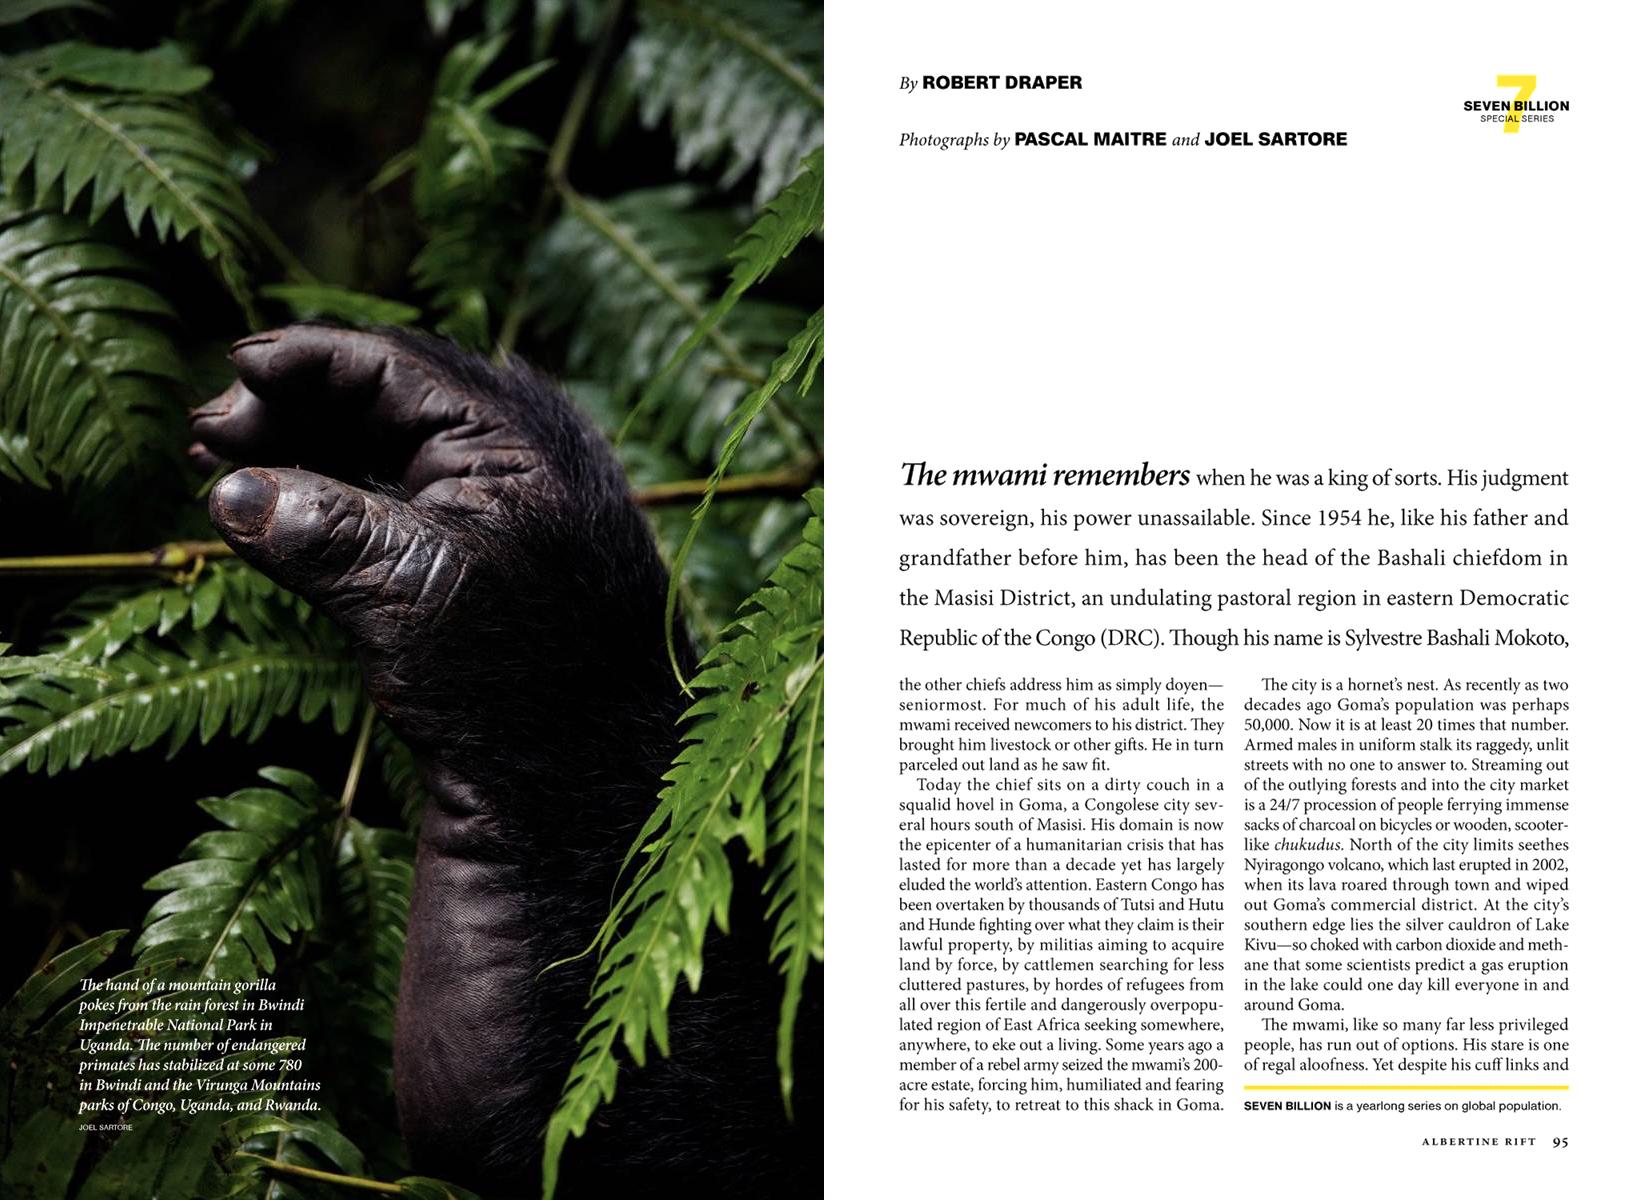 National Geographic,  November 2011, Photo by Joel Sartore